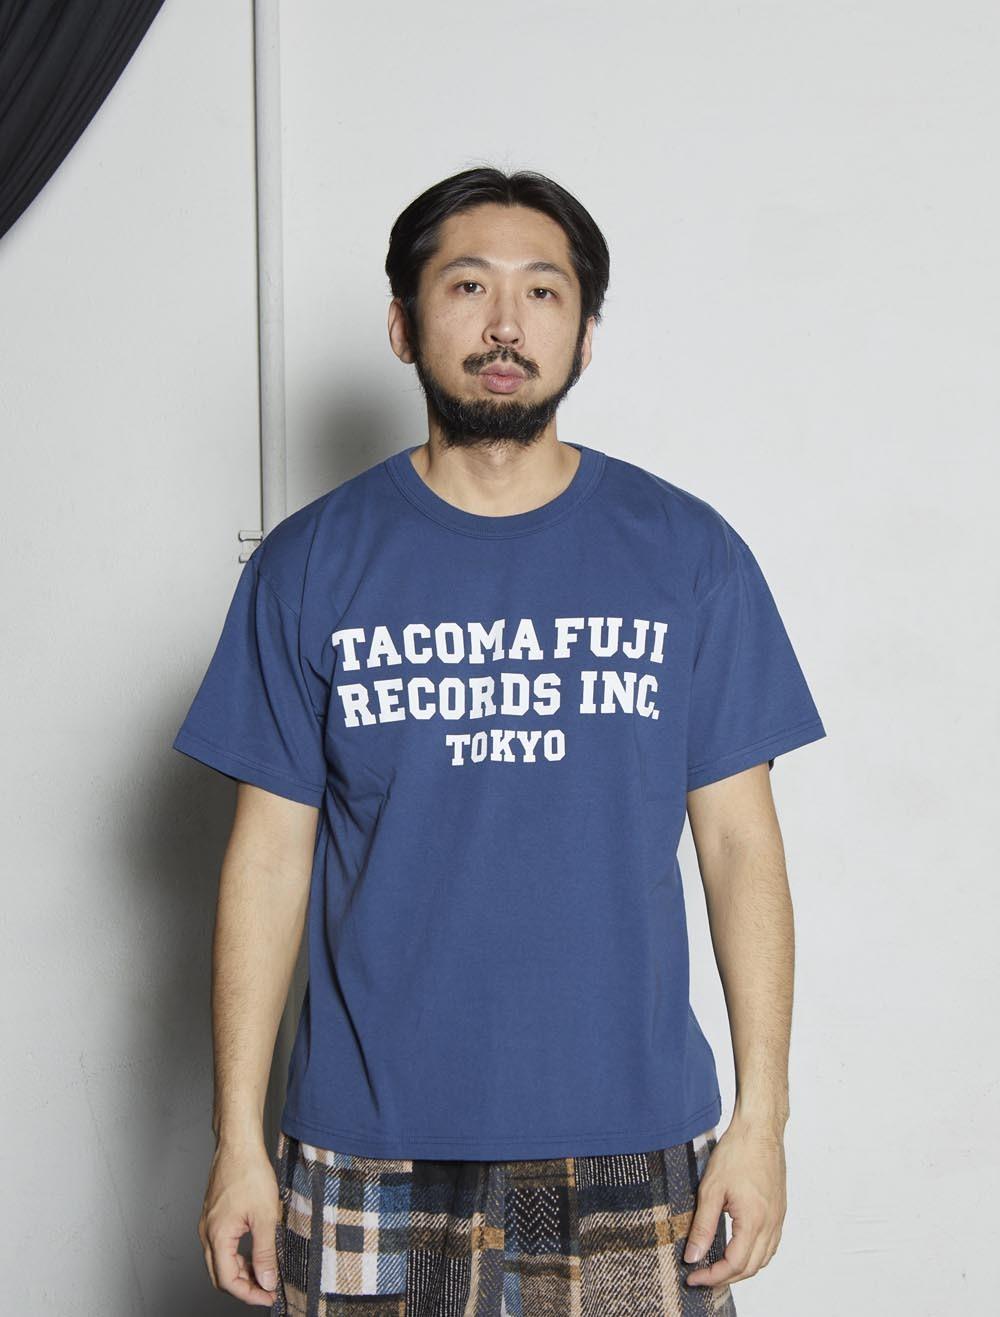 TACOMA FUJI RECORDS, INC. のご案内_a0152253_14182189.jpg